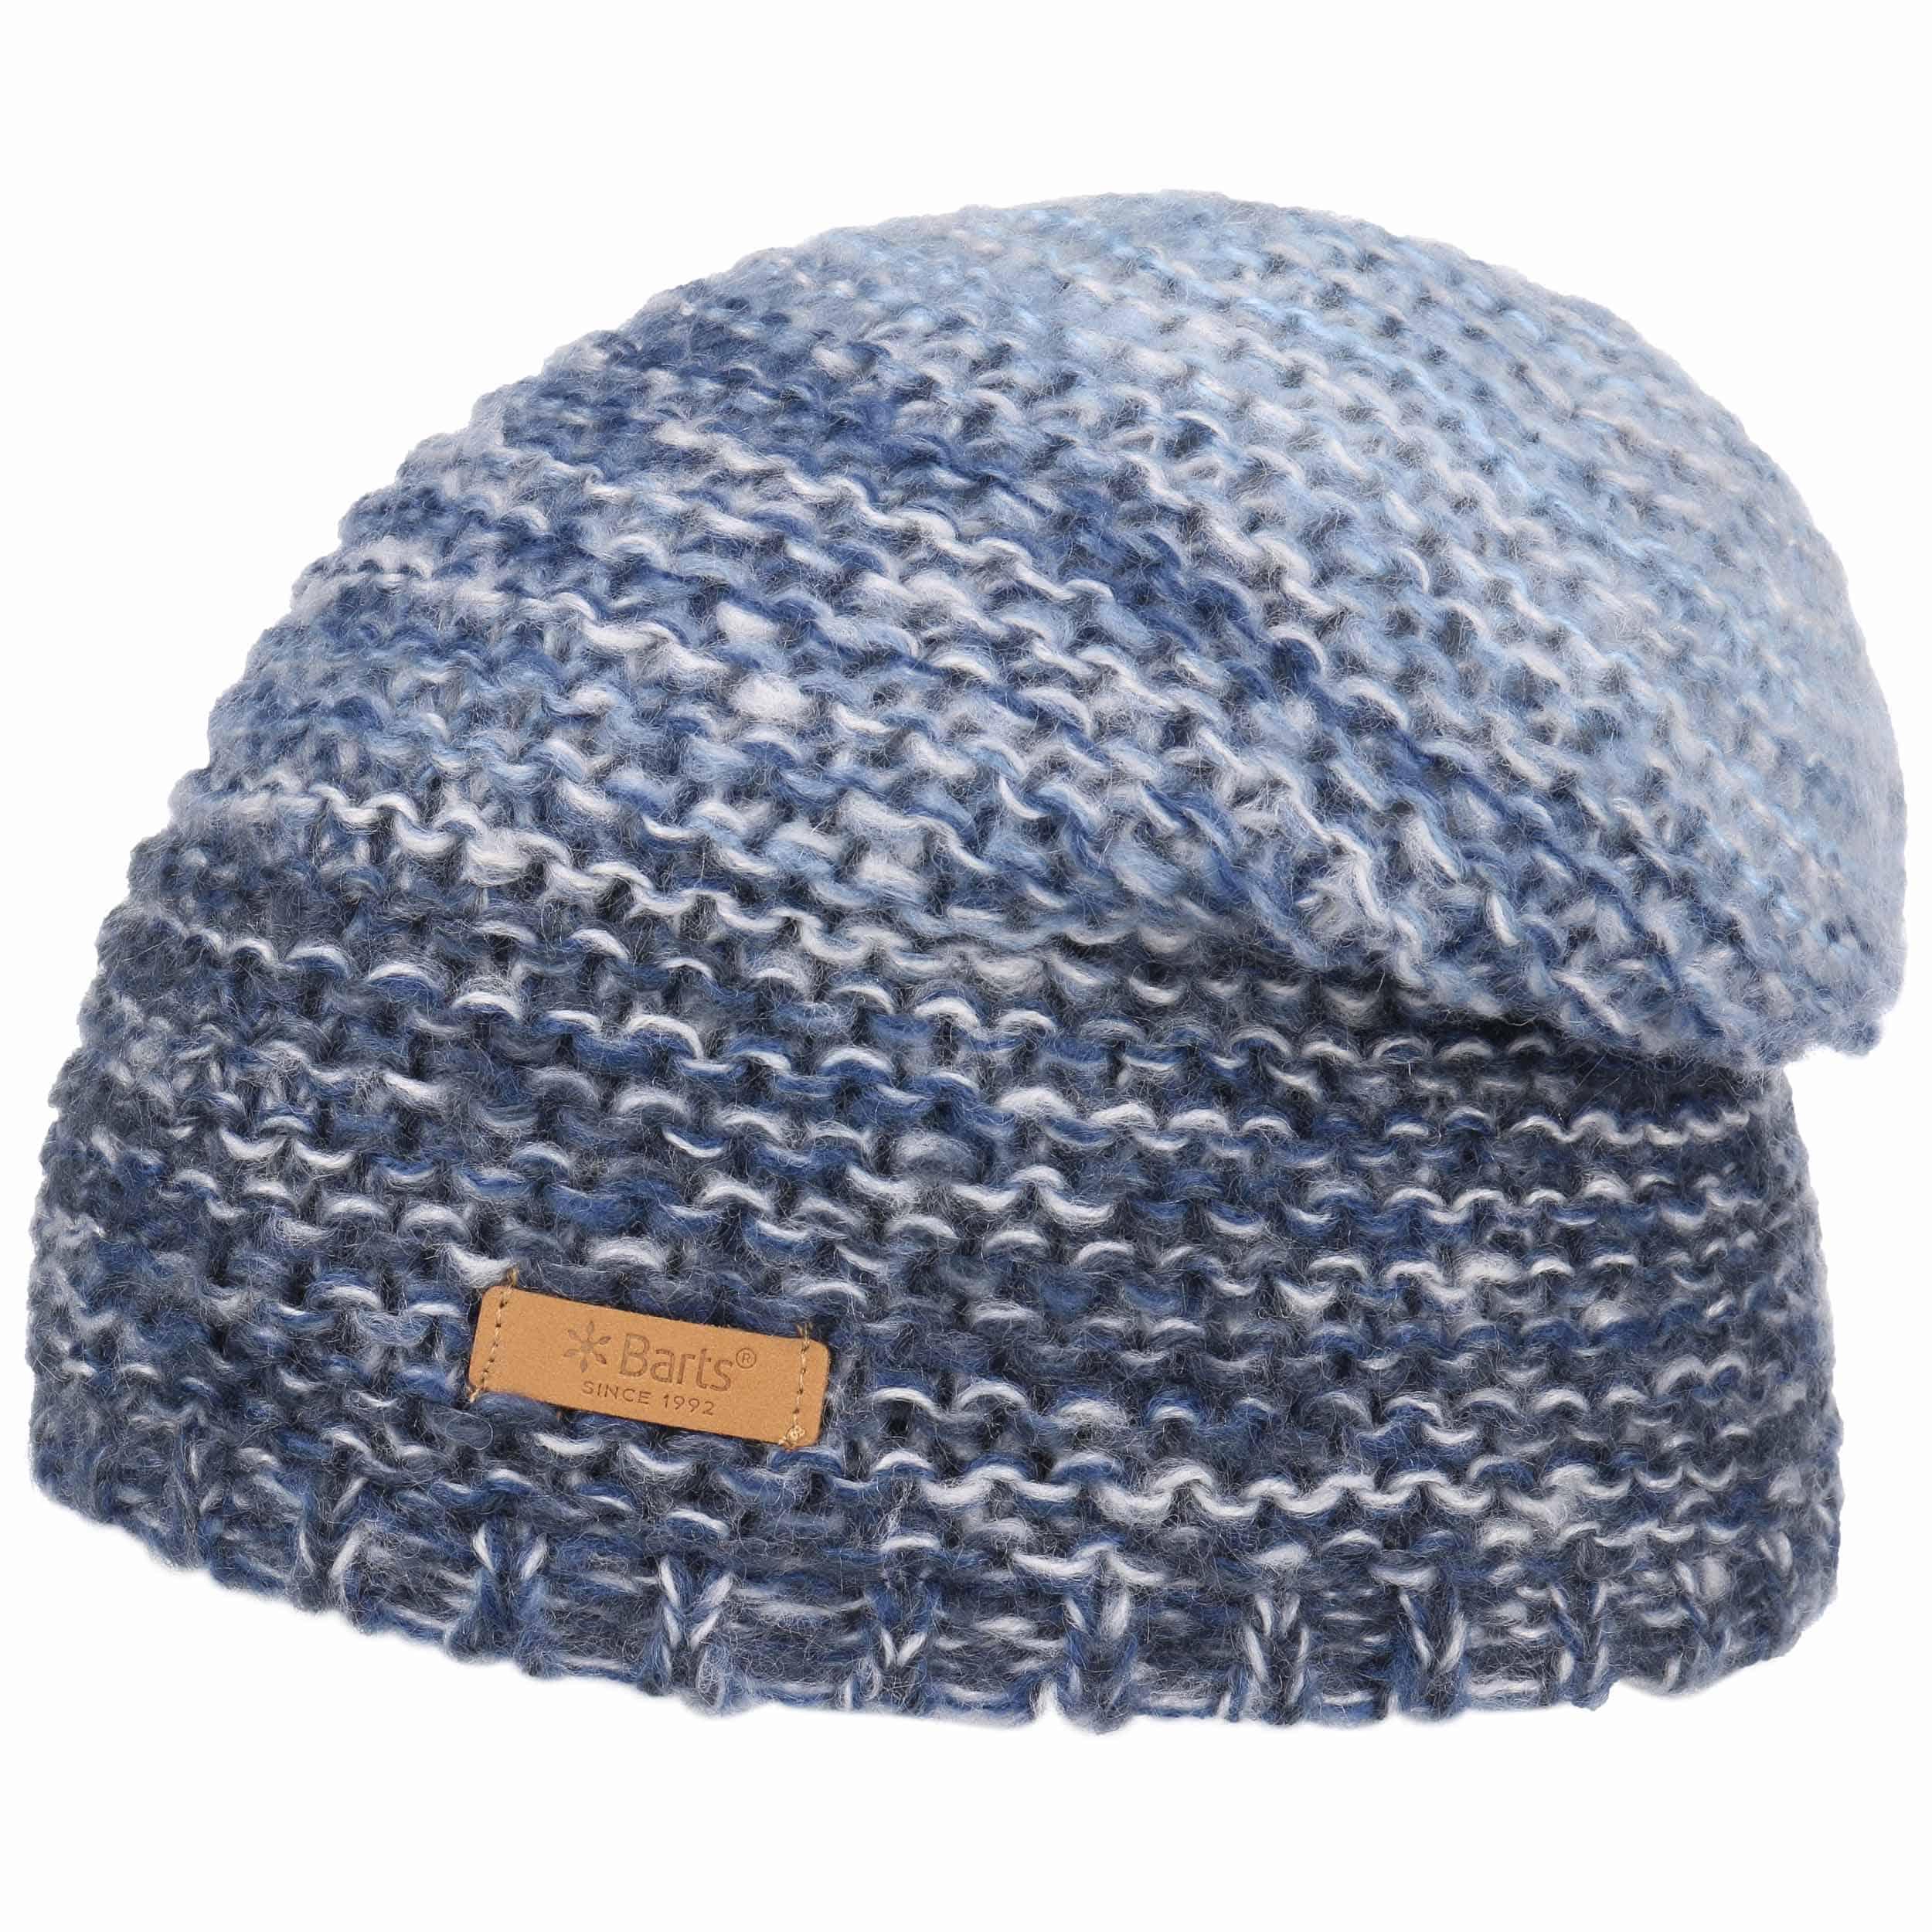 082abead6bf ... Sacha Women´s Knit Beanie by Barts - blue 4 ...